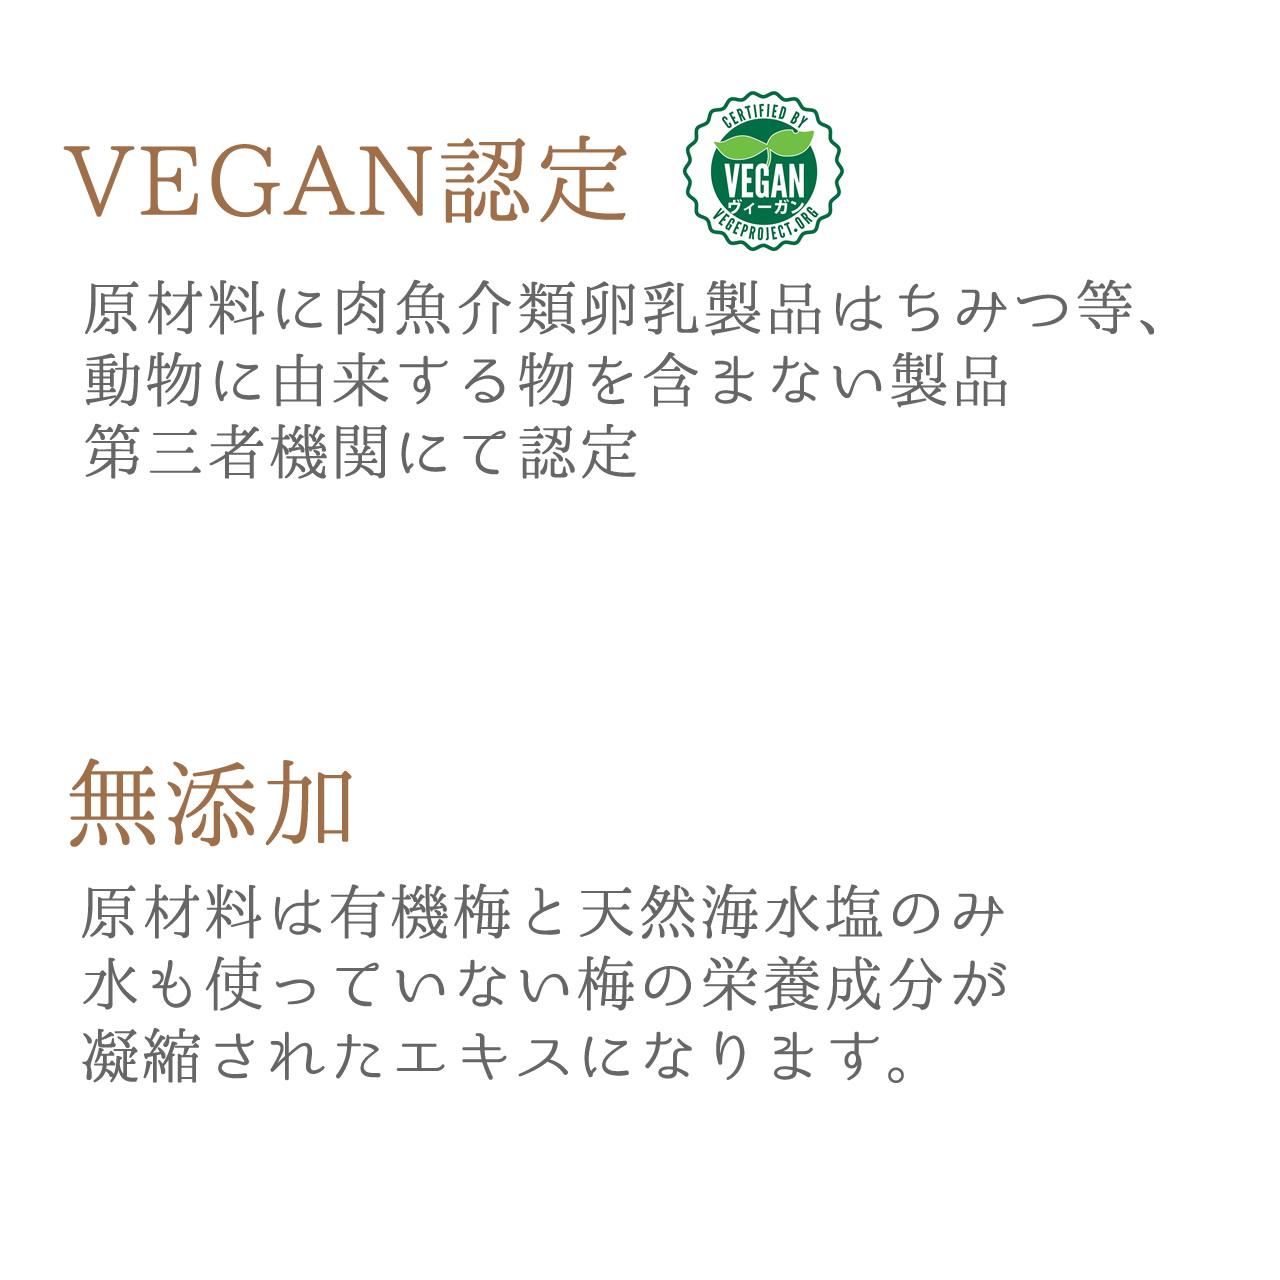 VEGAN認定を受けたオーガニック梅酢